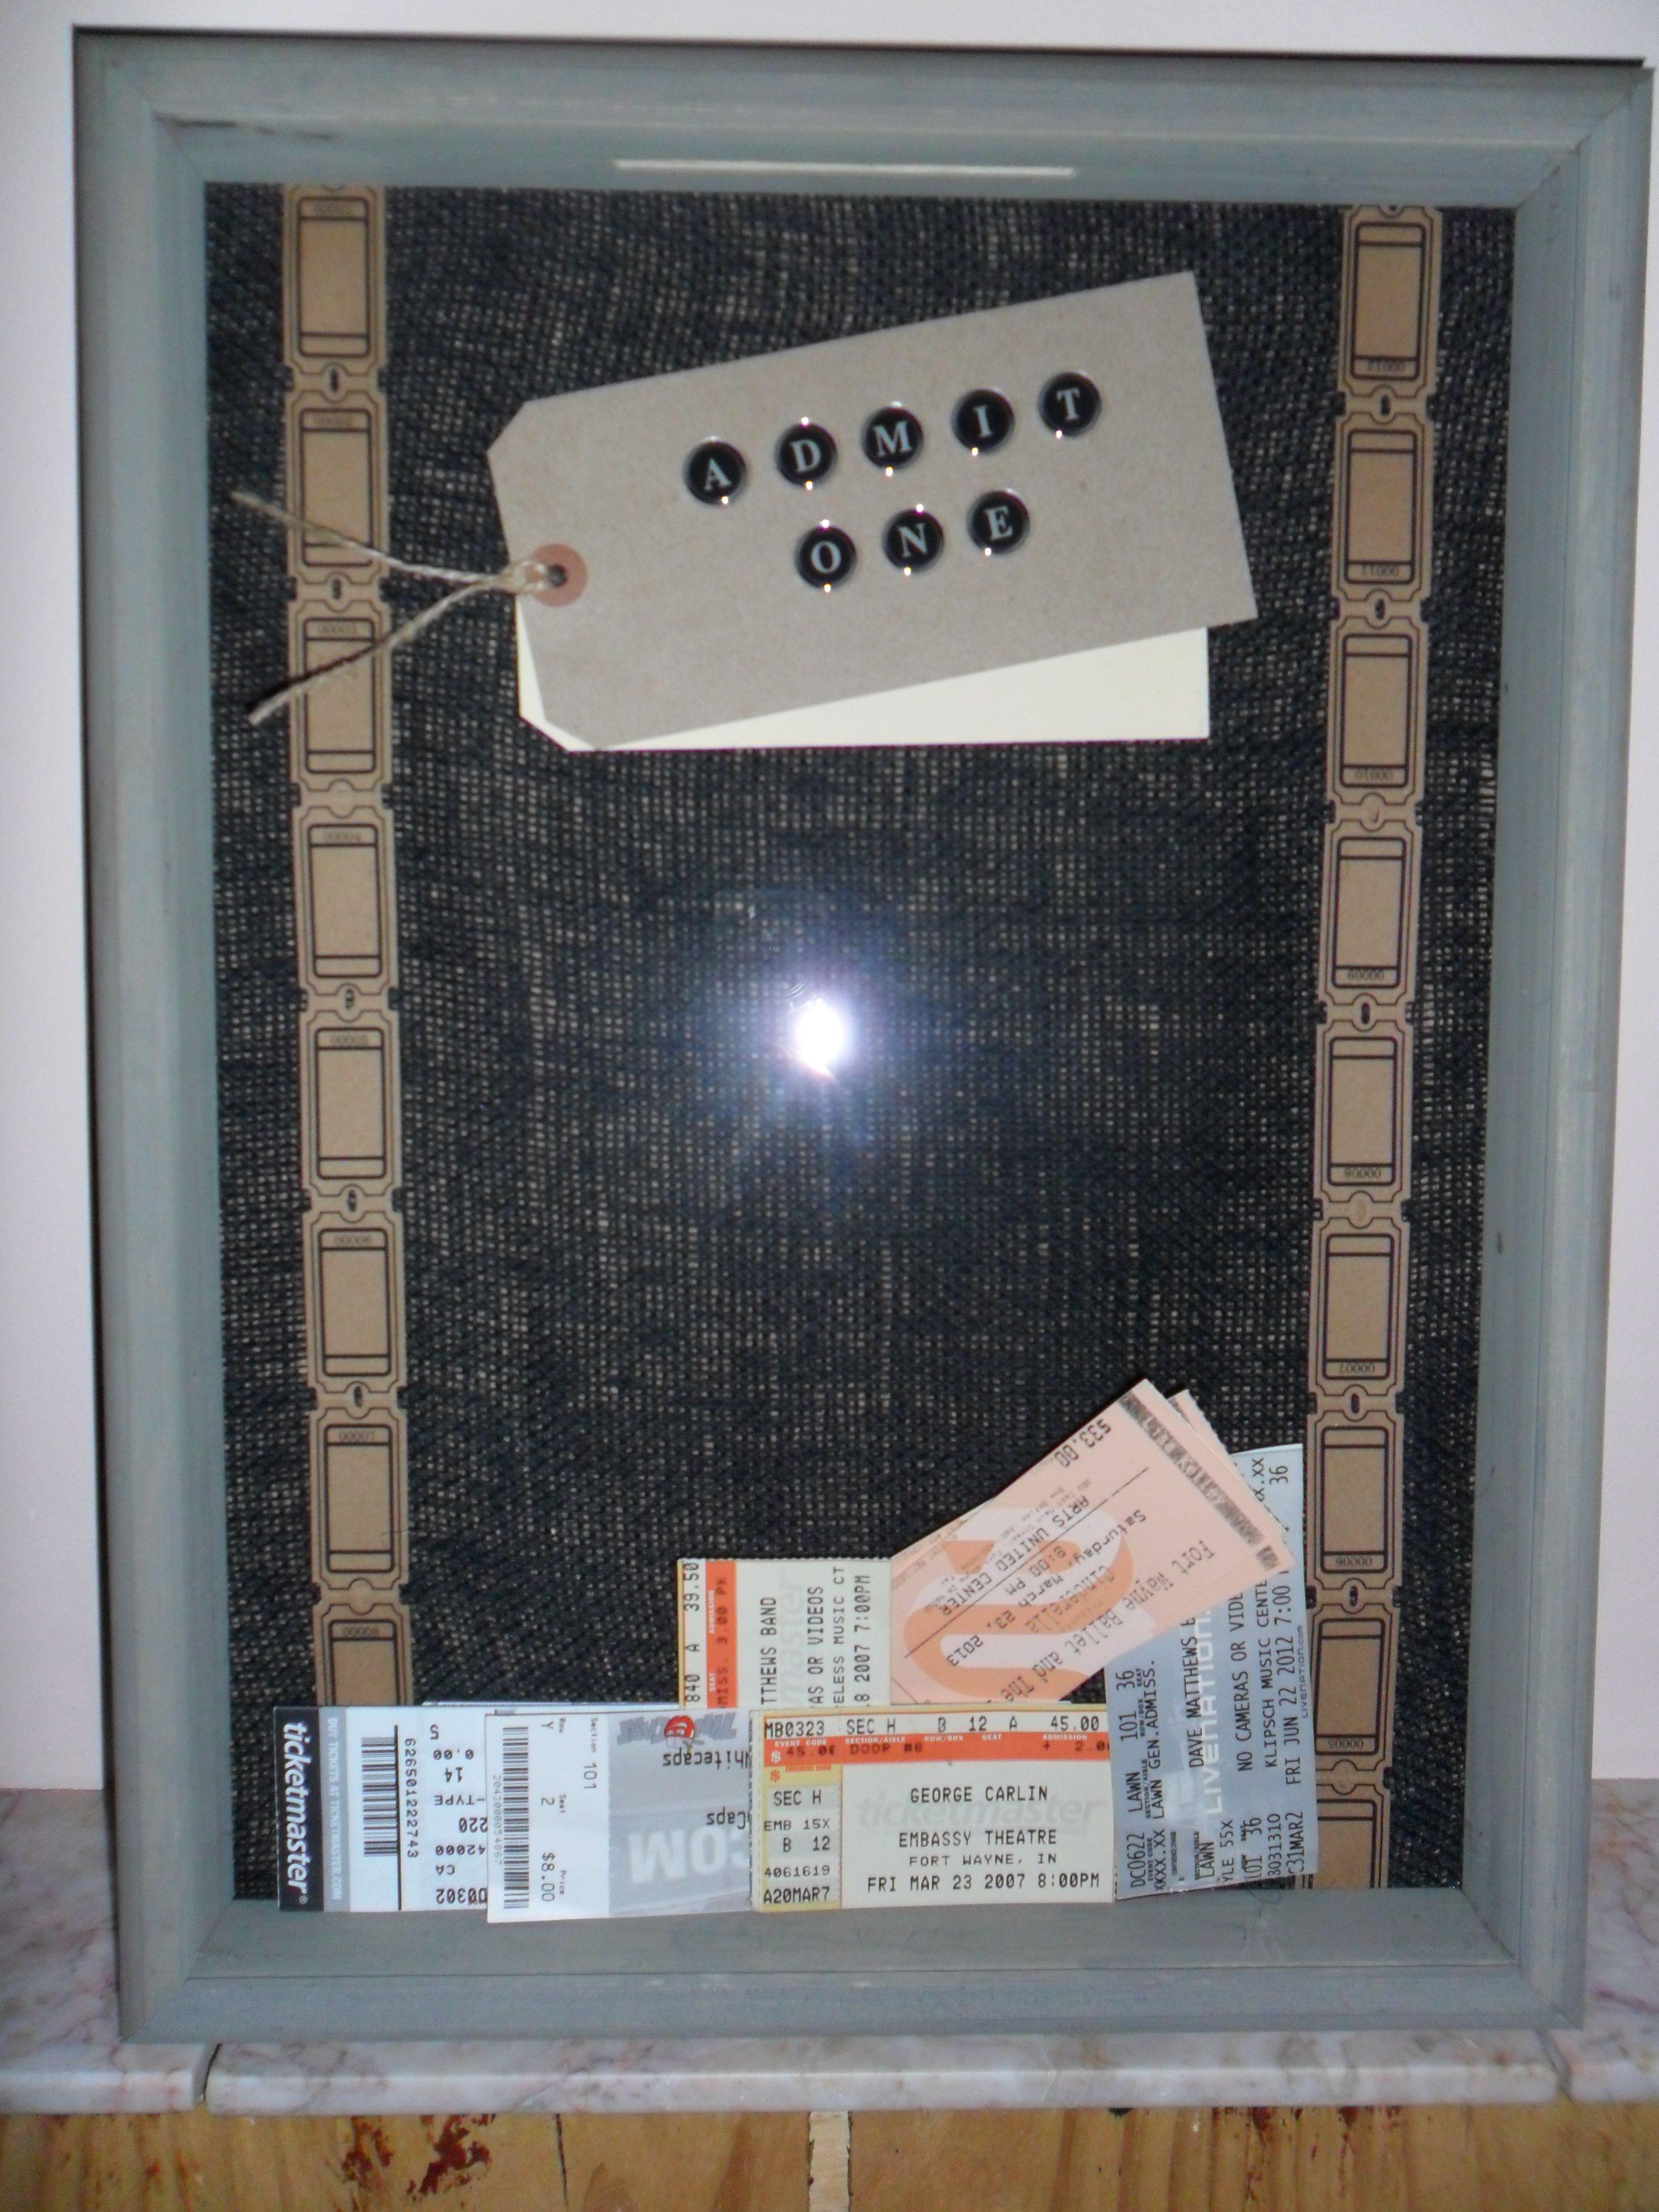 Admit one, ticket stub shadow box!